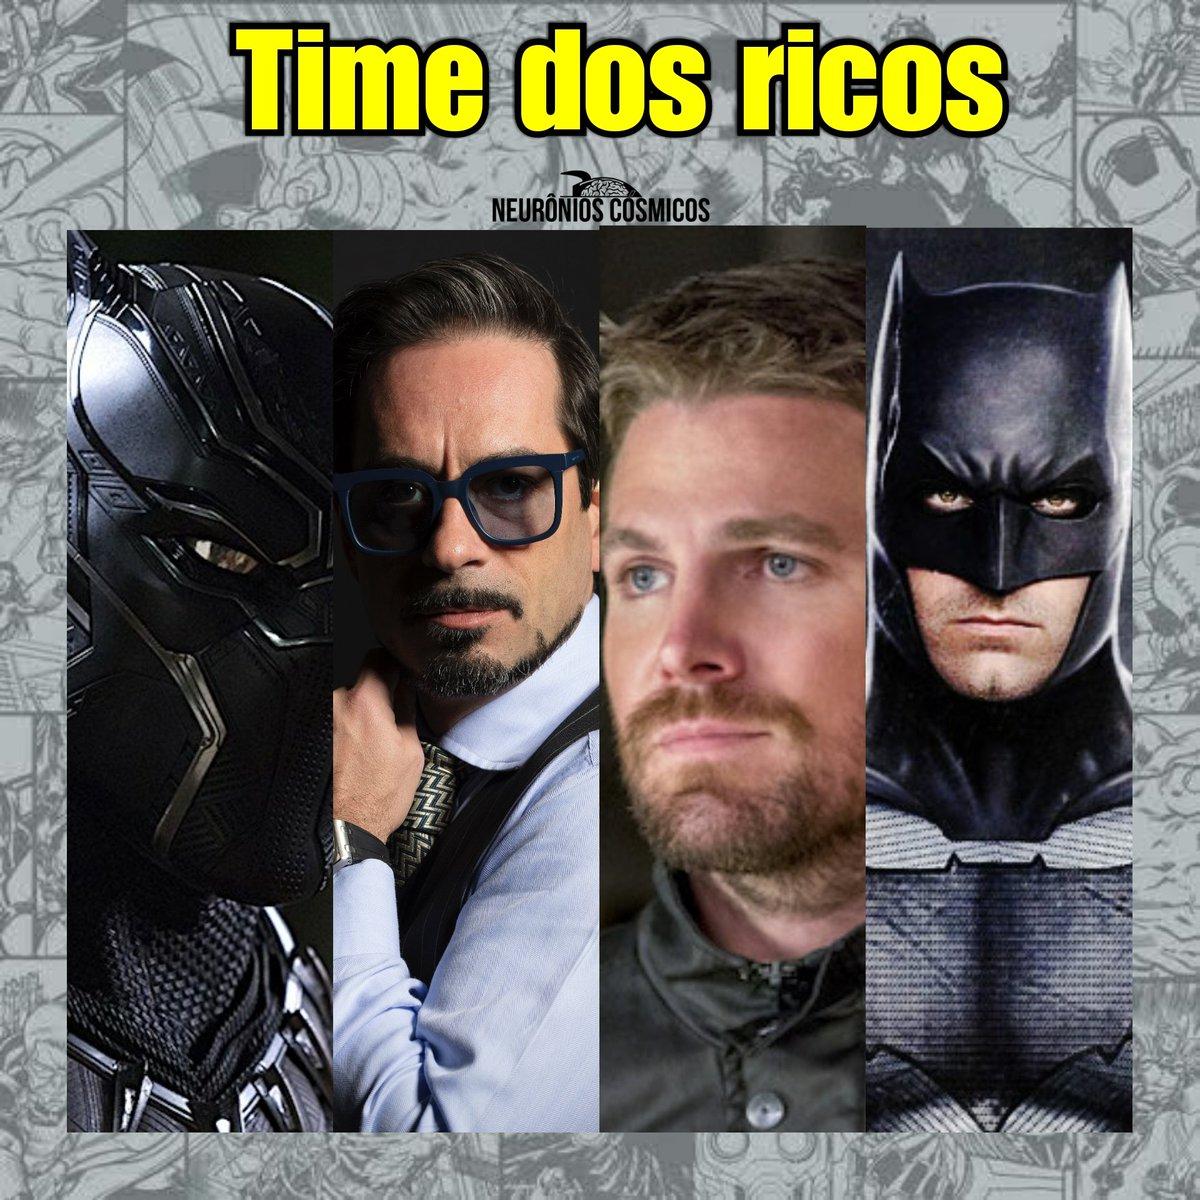 Tags #neuronioscosmicos #aracaju #sergipe #culturapop #nerd #geek #nco100kpic.twitter.com/LSFKlI0Lcz